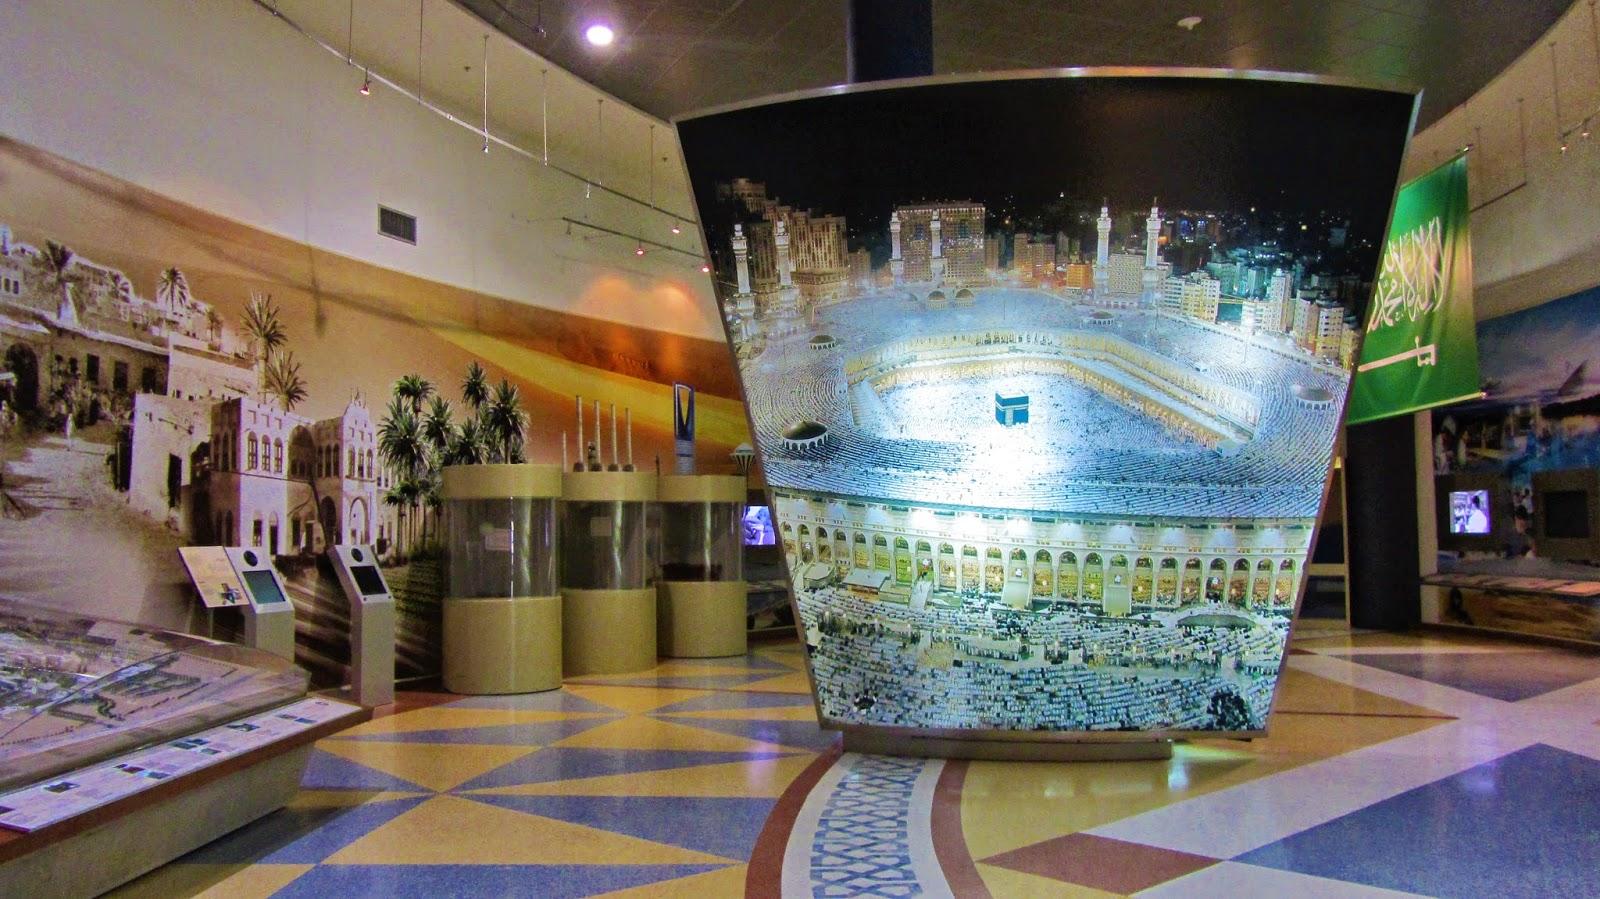 Scitech Al-Khobar Saudi Arabia introductory hall blog